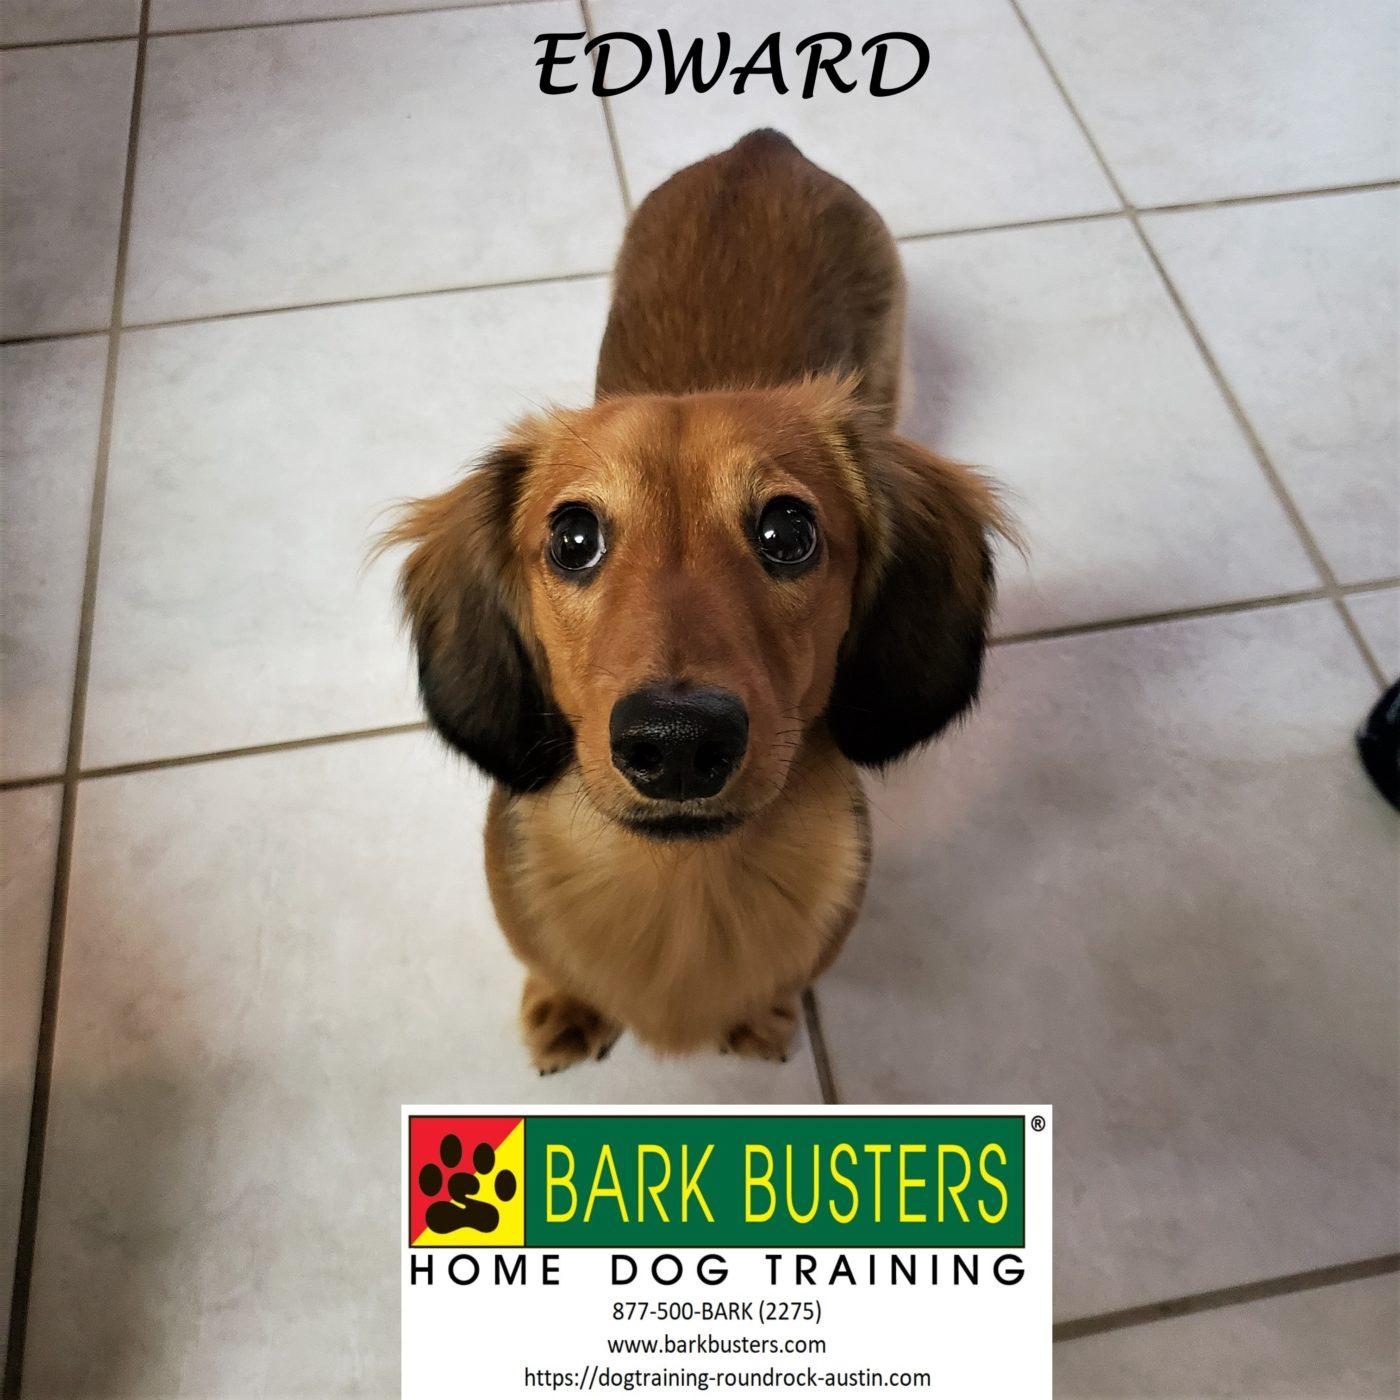 #dachshund #toilettraining #barking #destructivedog #dogsofbarkbusters #speakdog #inhomedogtraining #dogtraininggeorgetown #barkbusters